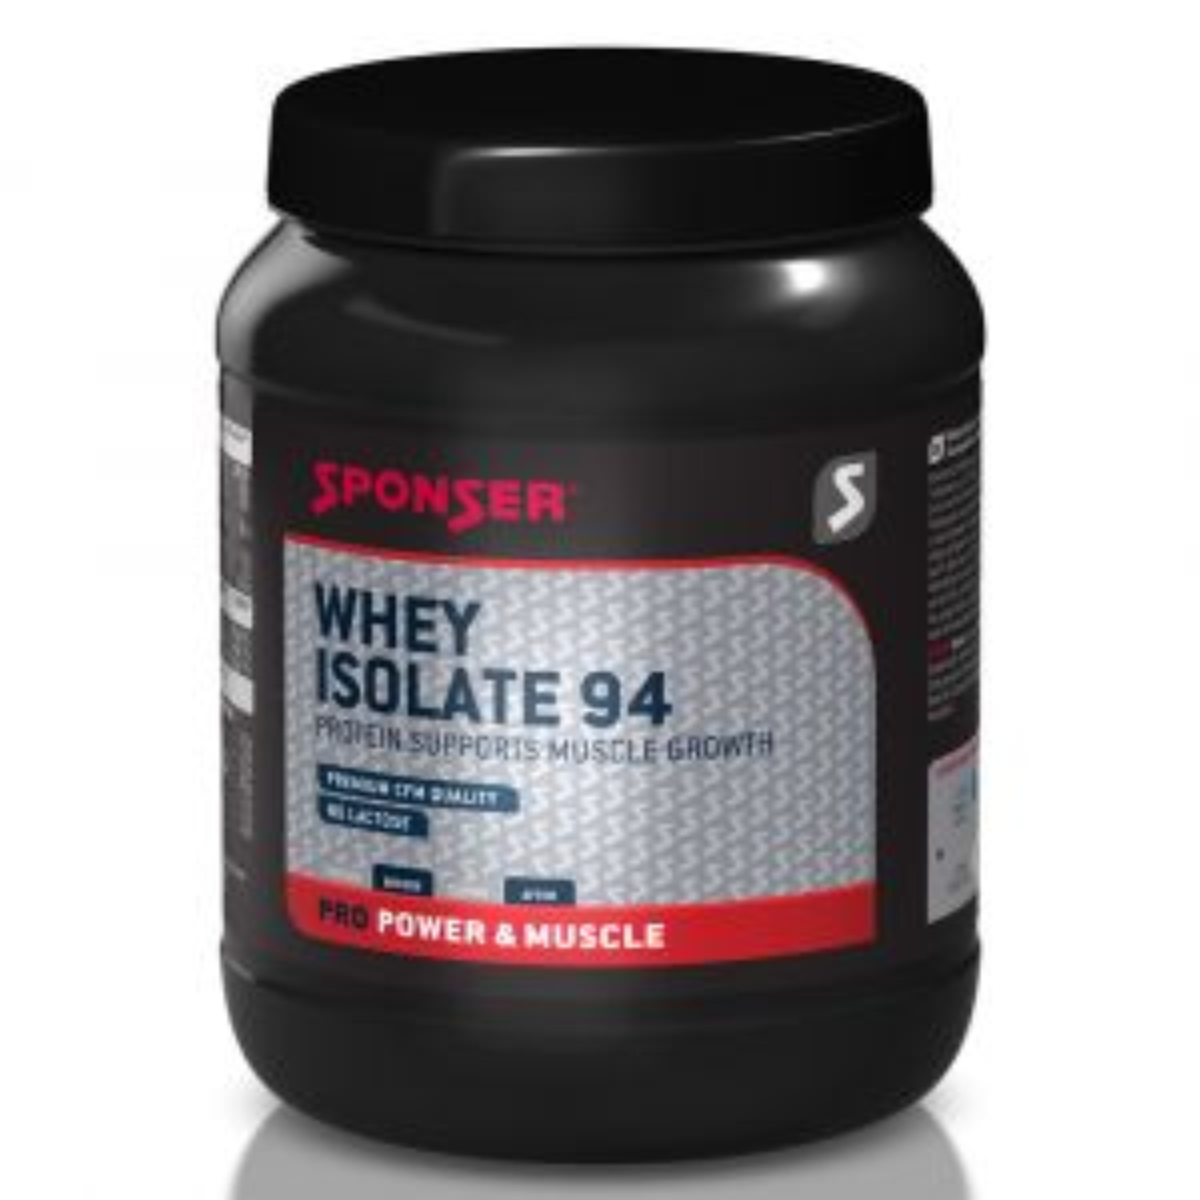 Whey Isolate 94 Molkenproteinisolate Eiweißpulver 425g Mango - Mindesthaltbarkeitsdatum 12/2021